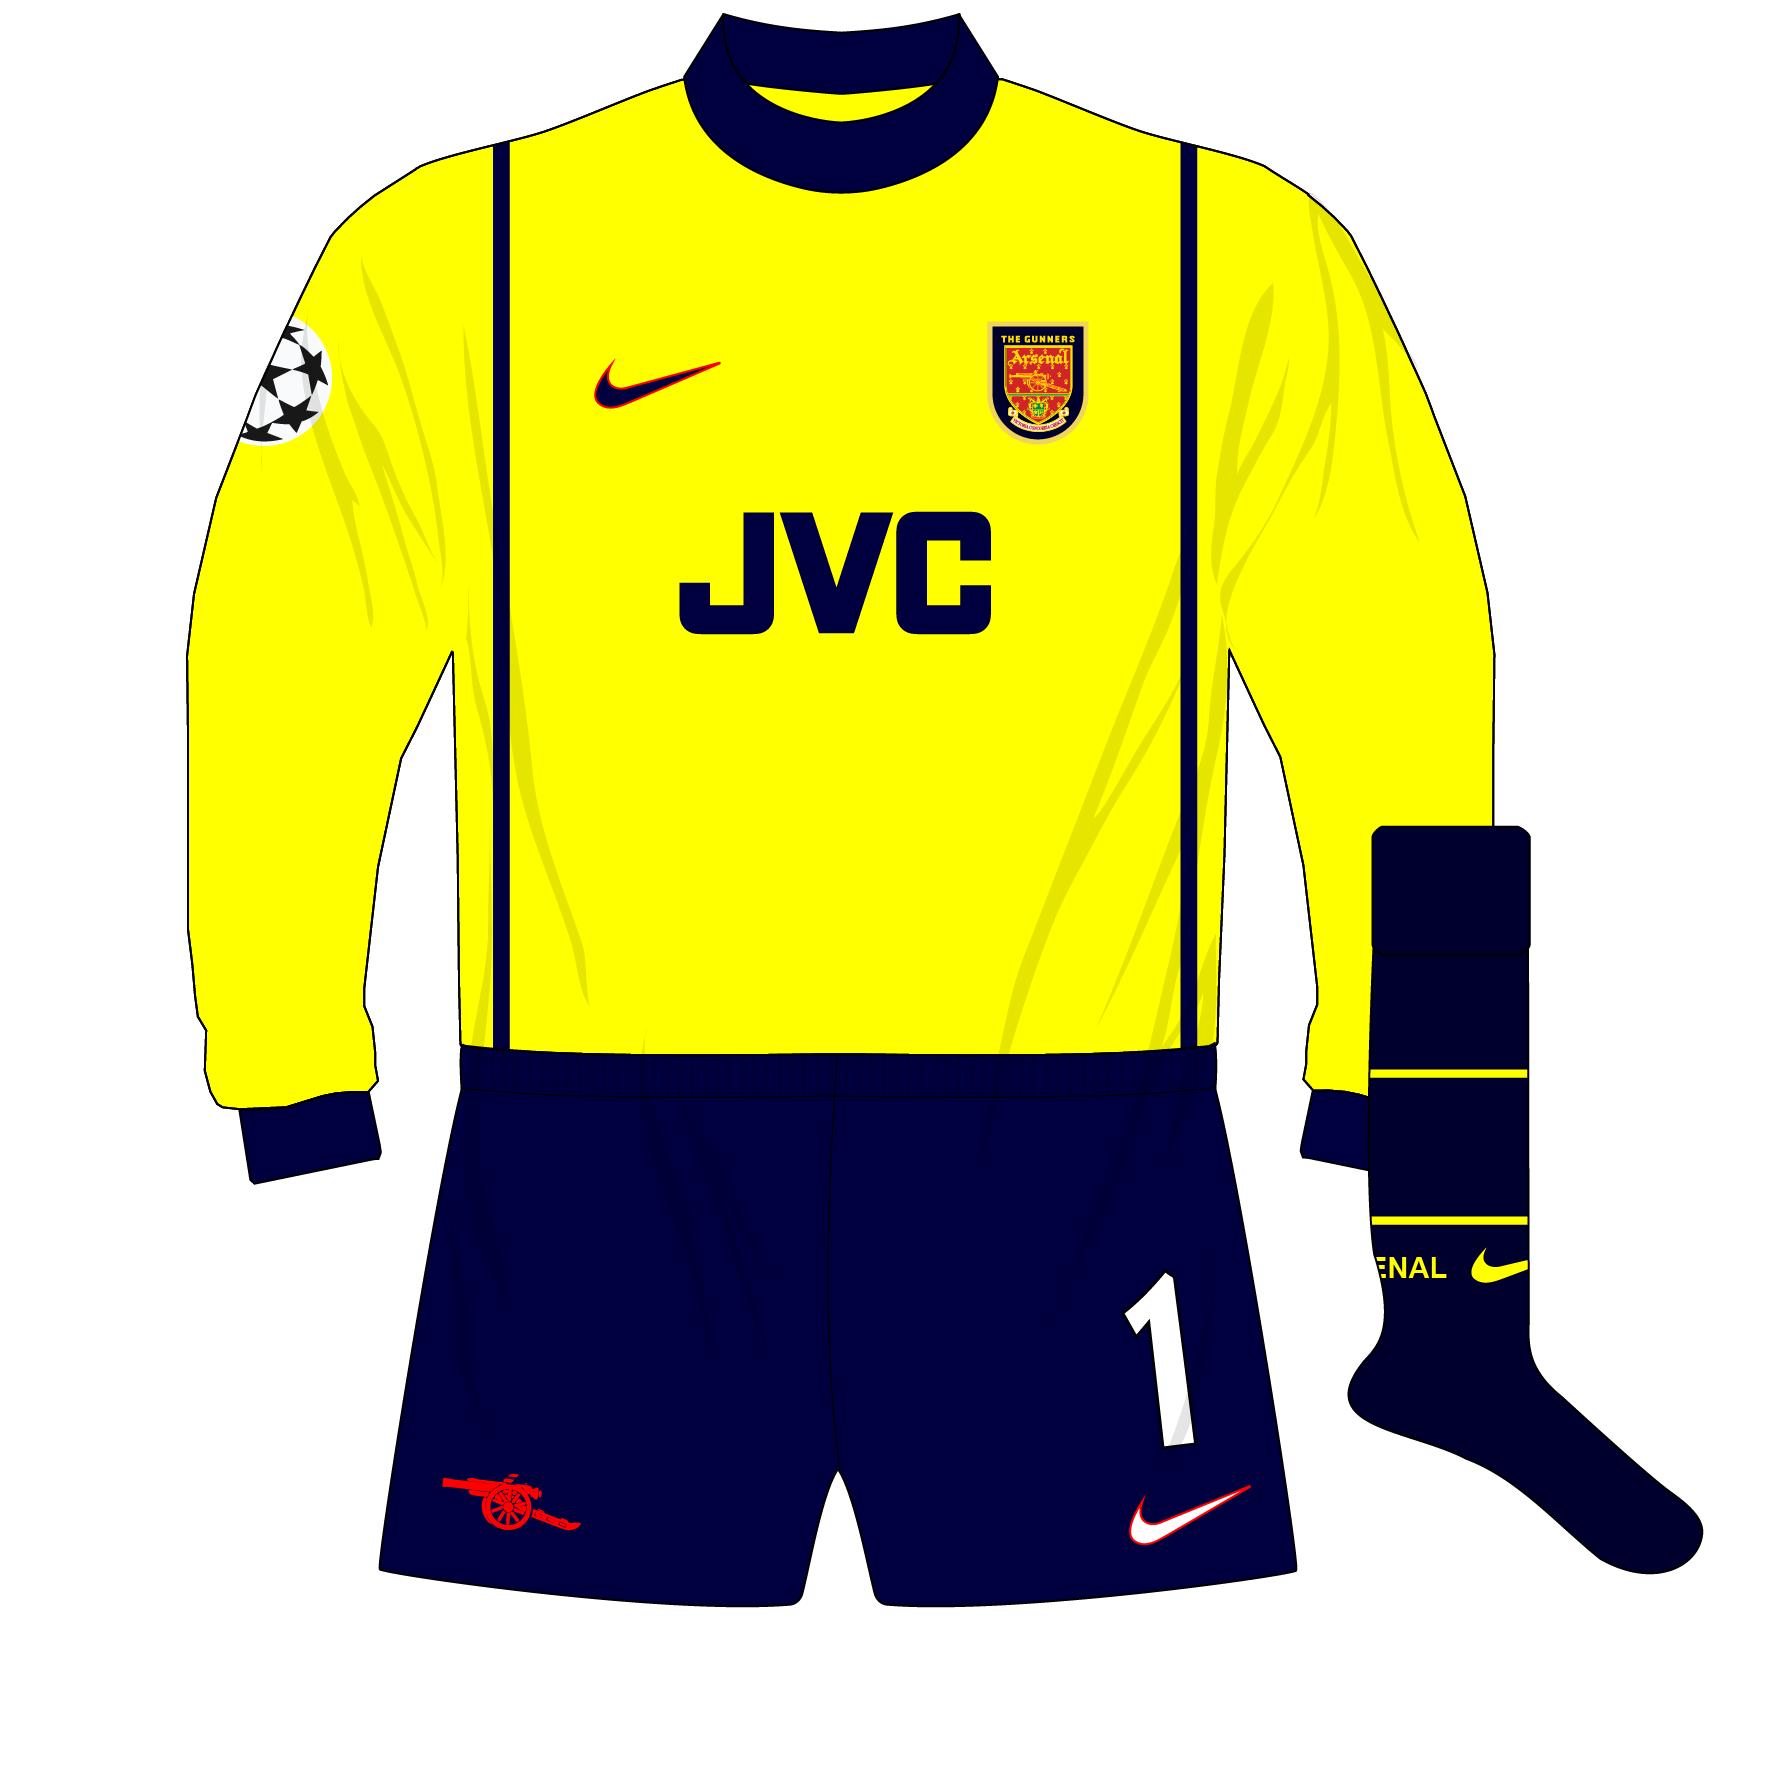 sale retailer 67e32 29e37 Arsenal-Nike-1998-1999-yellow-goalkeeper-shirt-kit-Champions ...